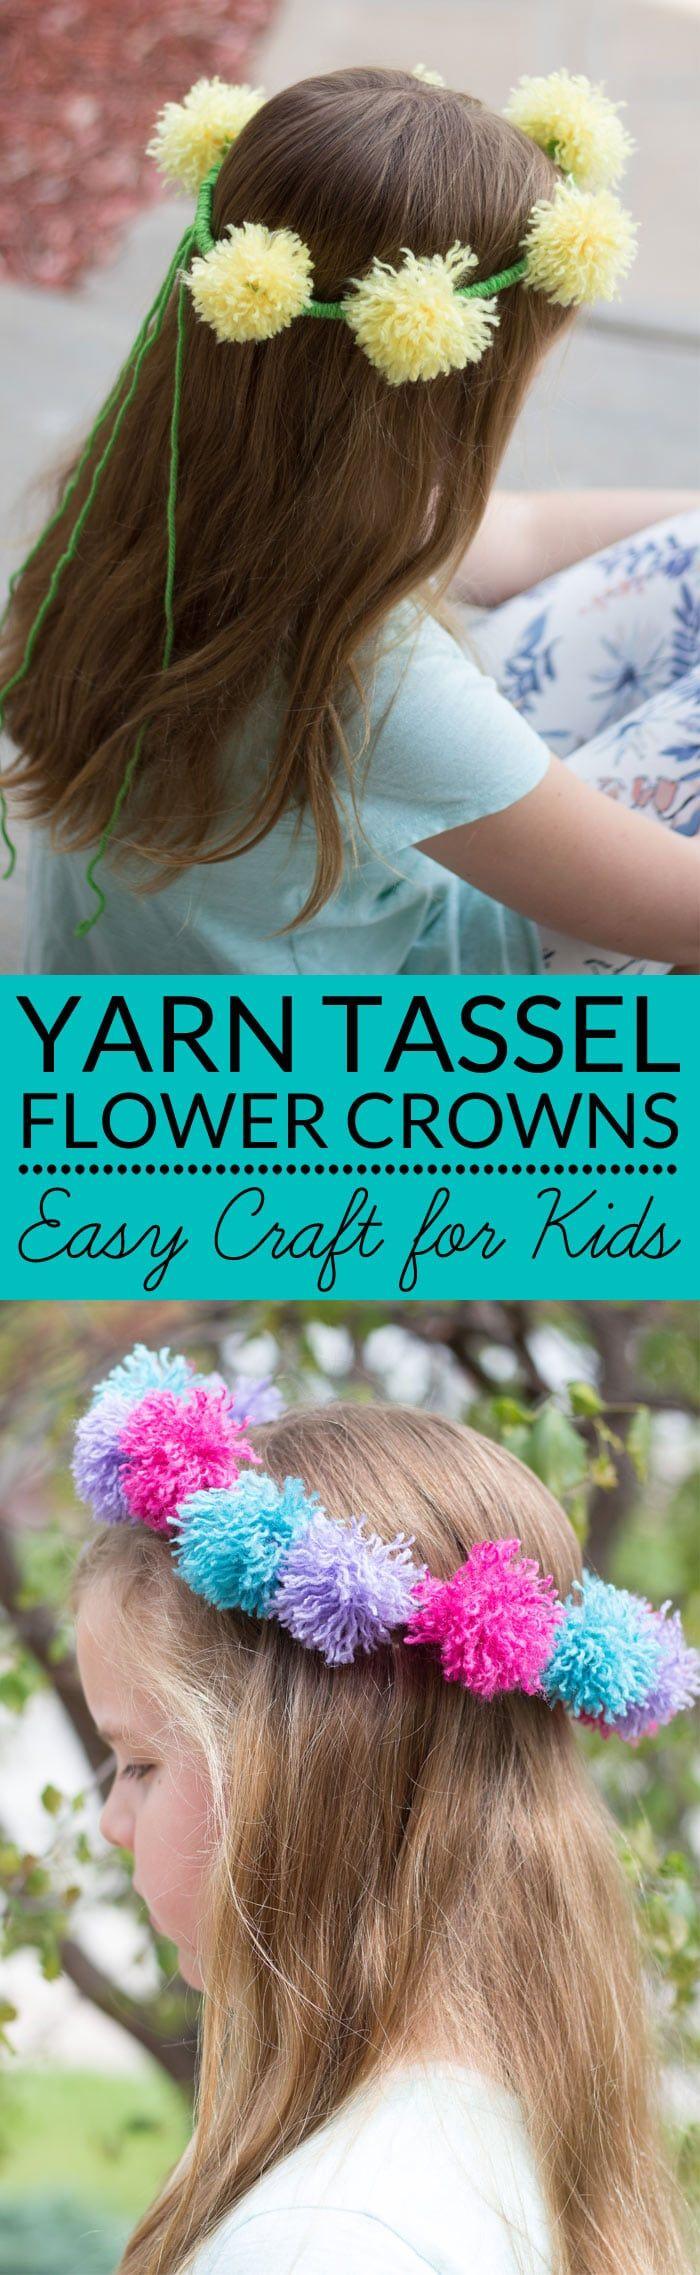 Flower Crowns | Tassel Flowers | Flower chain crown | Dandelion crown  via @brendidblog